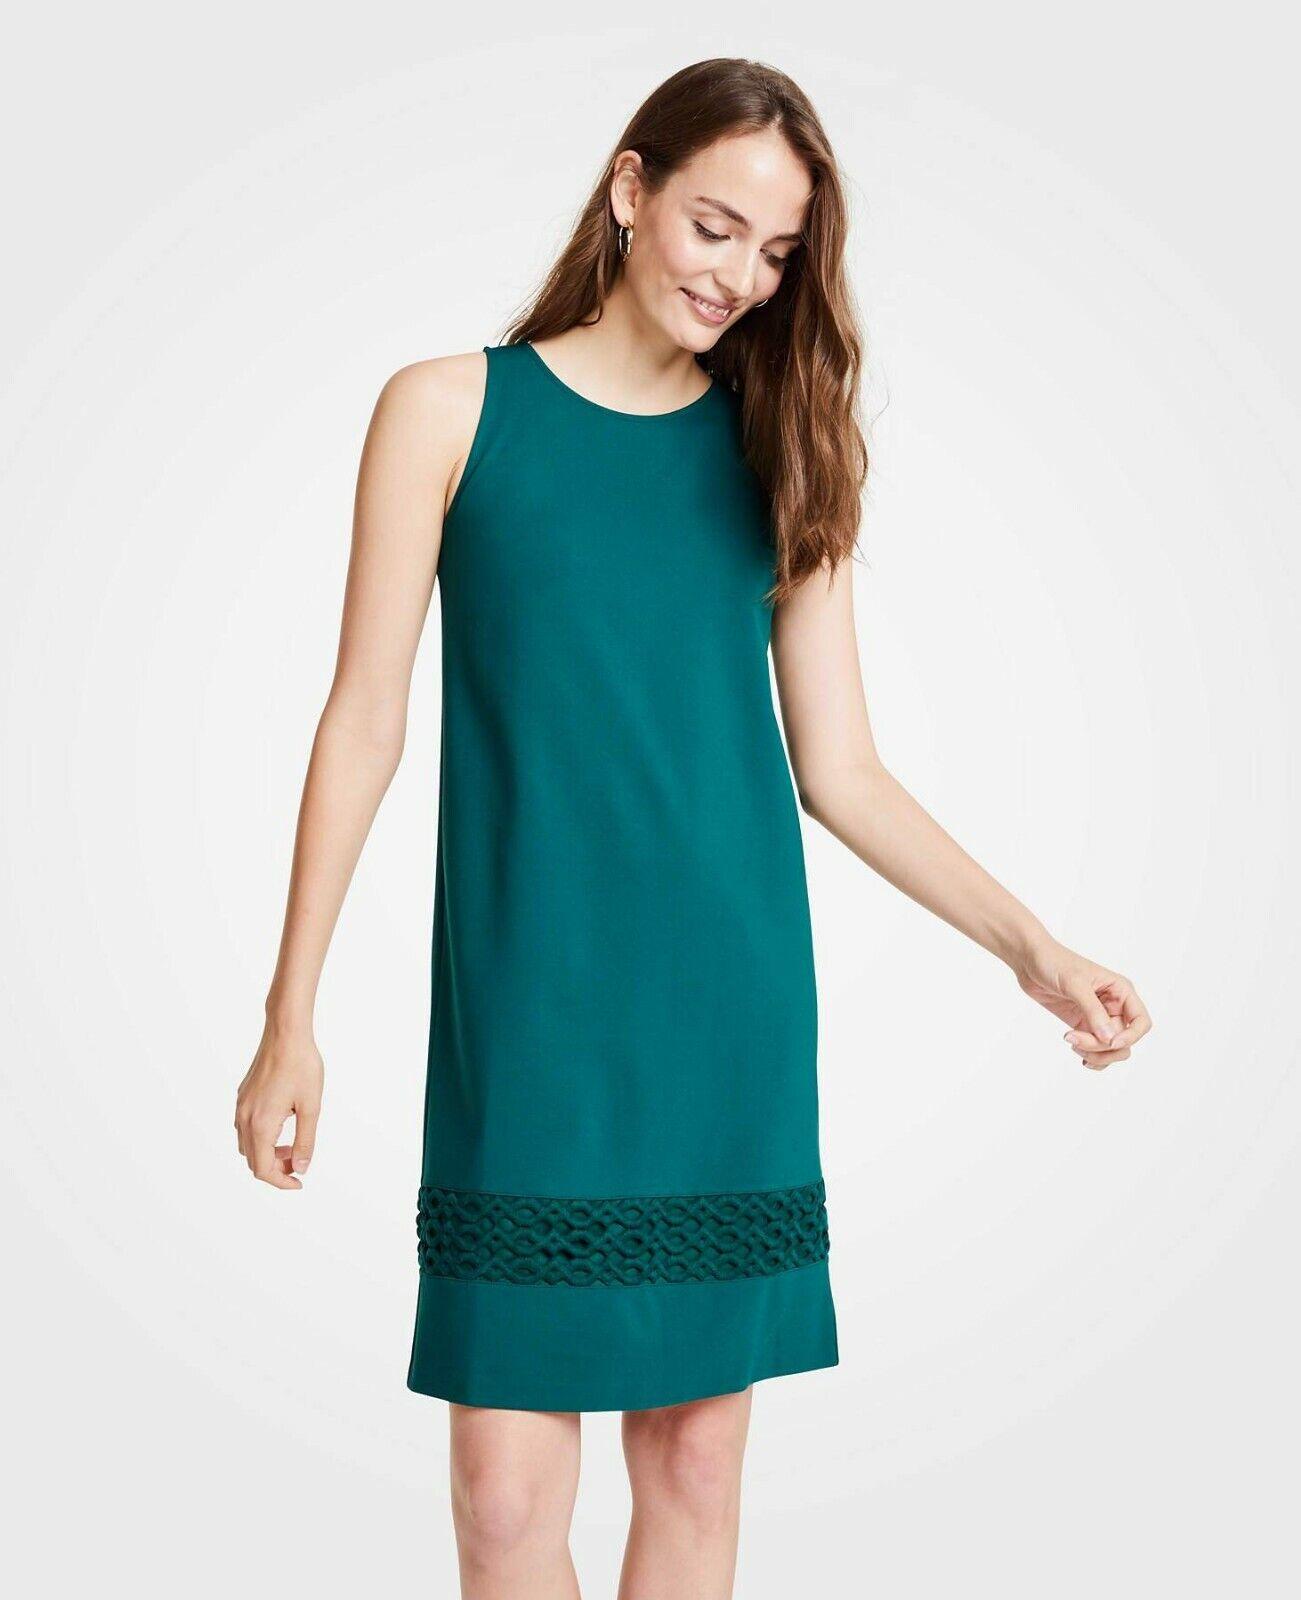 NWT Ann Taylor Petite Lace Hem Tank Dress in Rich Cypress Größe 0P